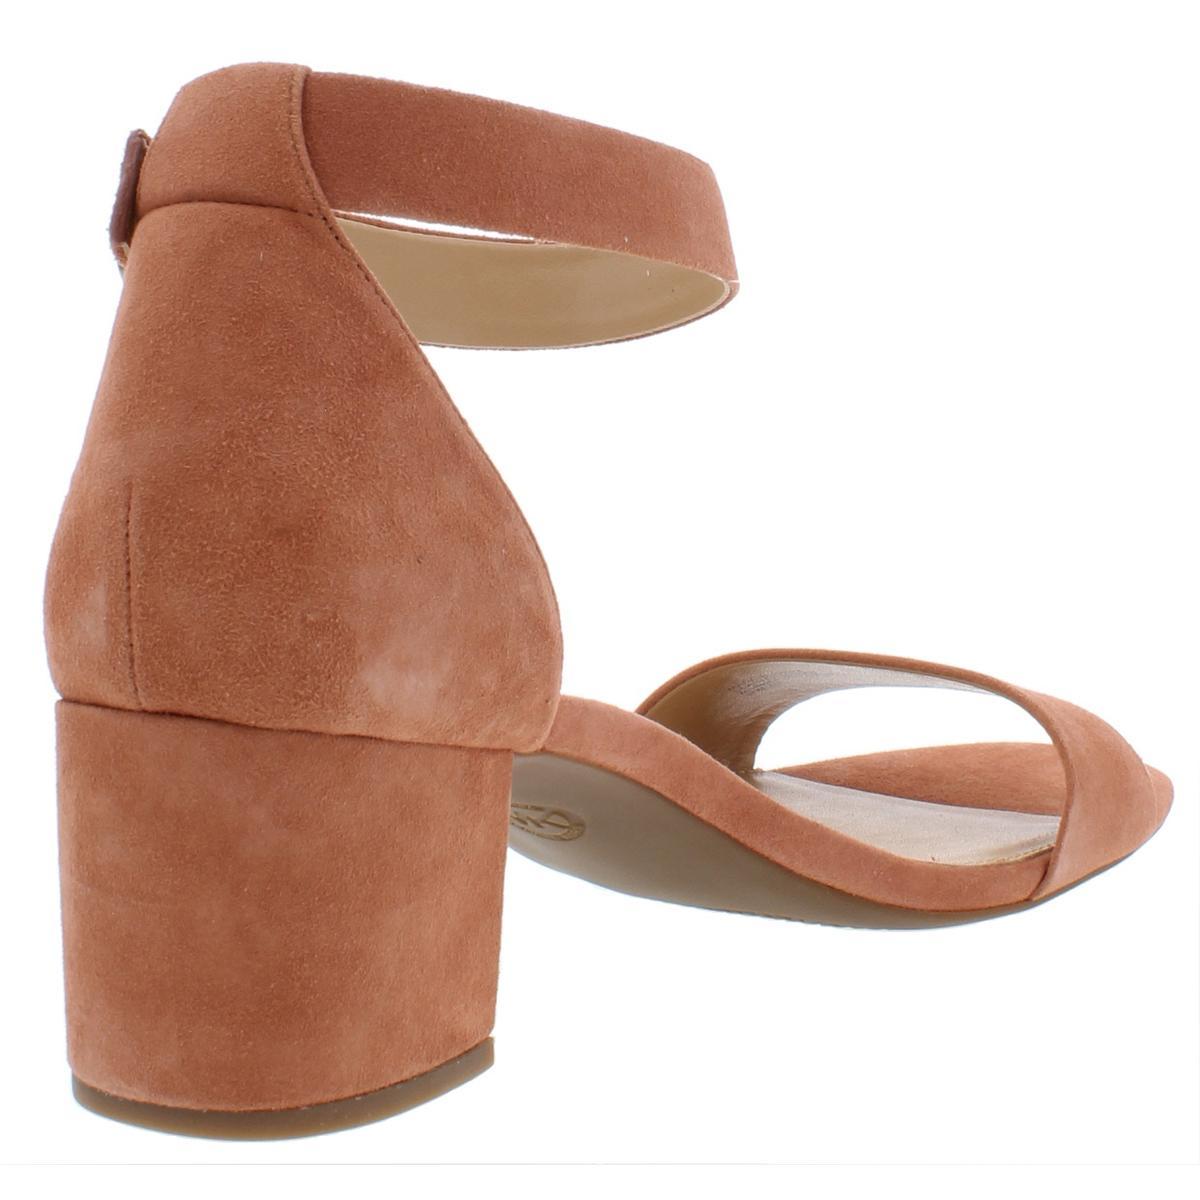 MICHAEL-Michael-Kors-Womens-Lena-Ankle-Strap-Dress-Sandals-Evening-BHFO-6788 thumbnail 8